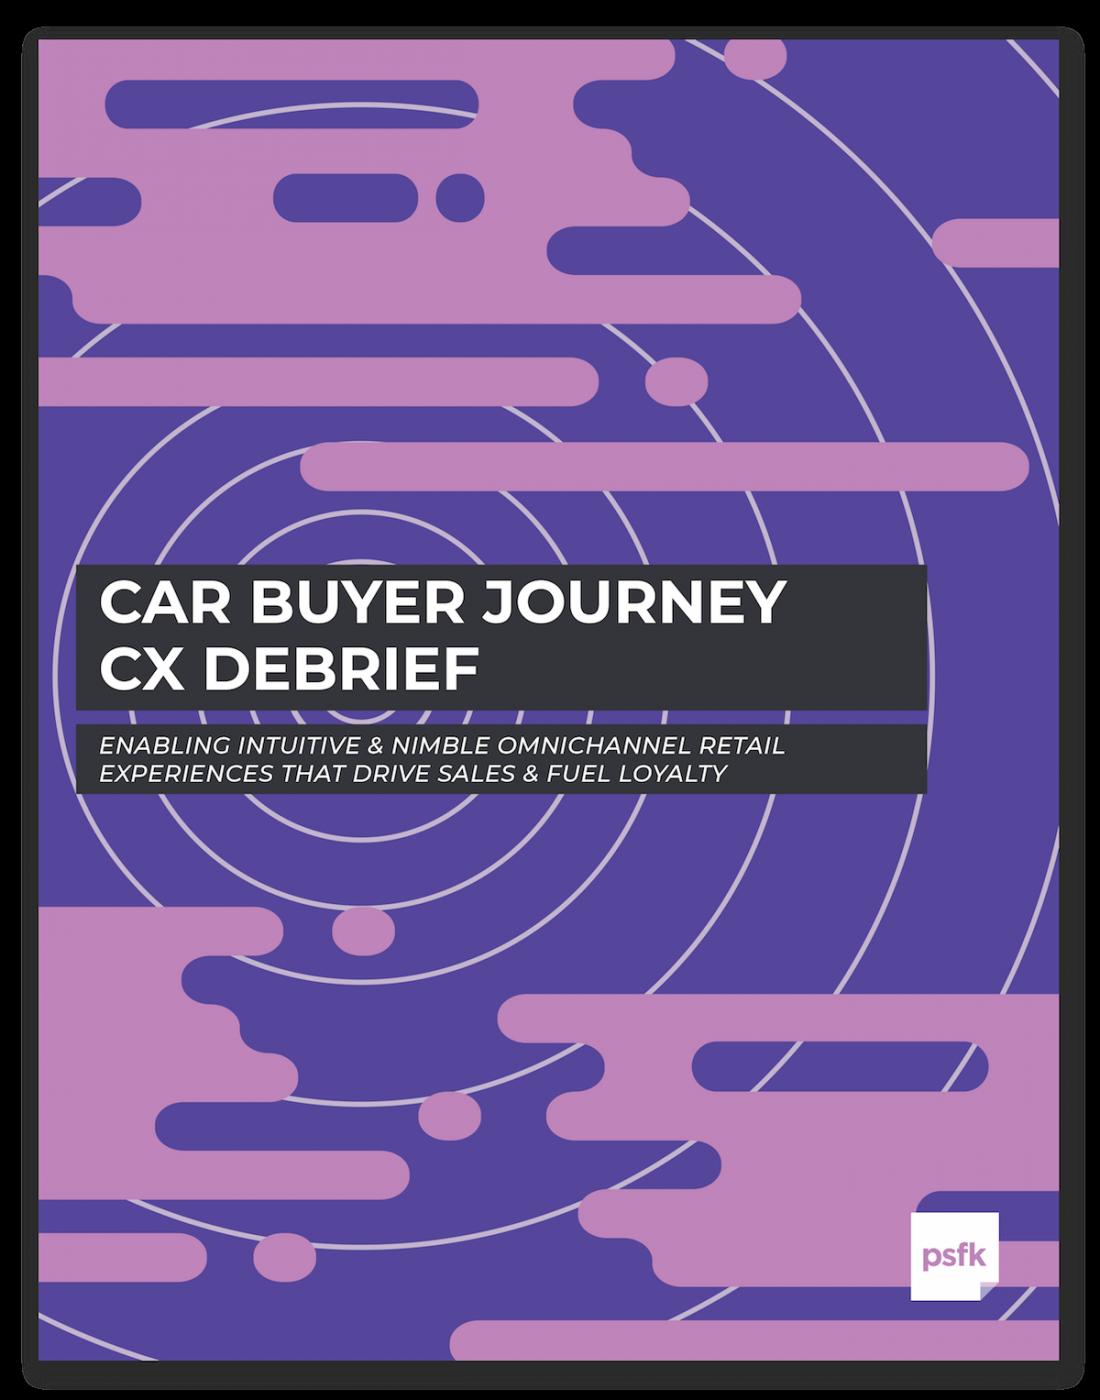 The Car Buyer Journey CX Debrief